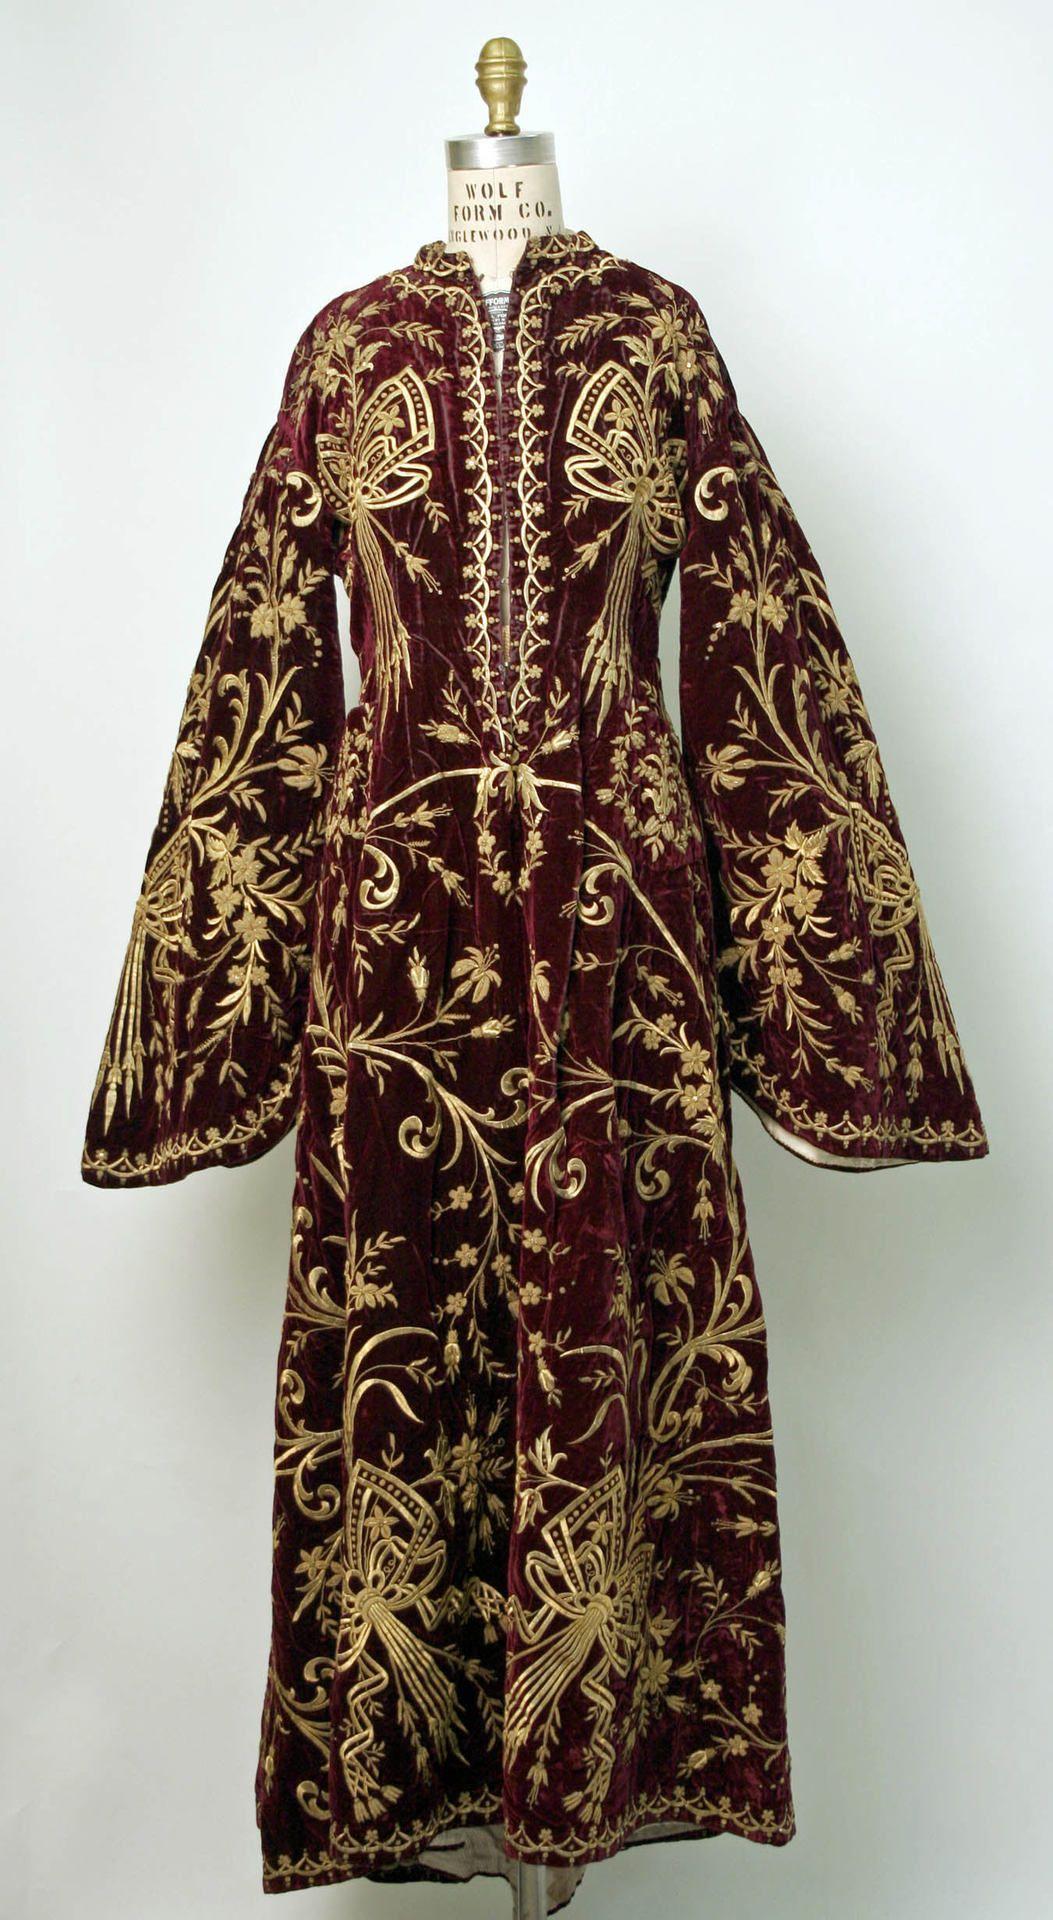 Ottoman robe th century wear pinterest ottomans robe and